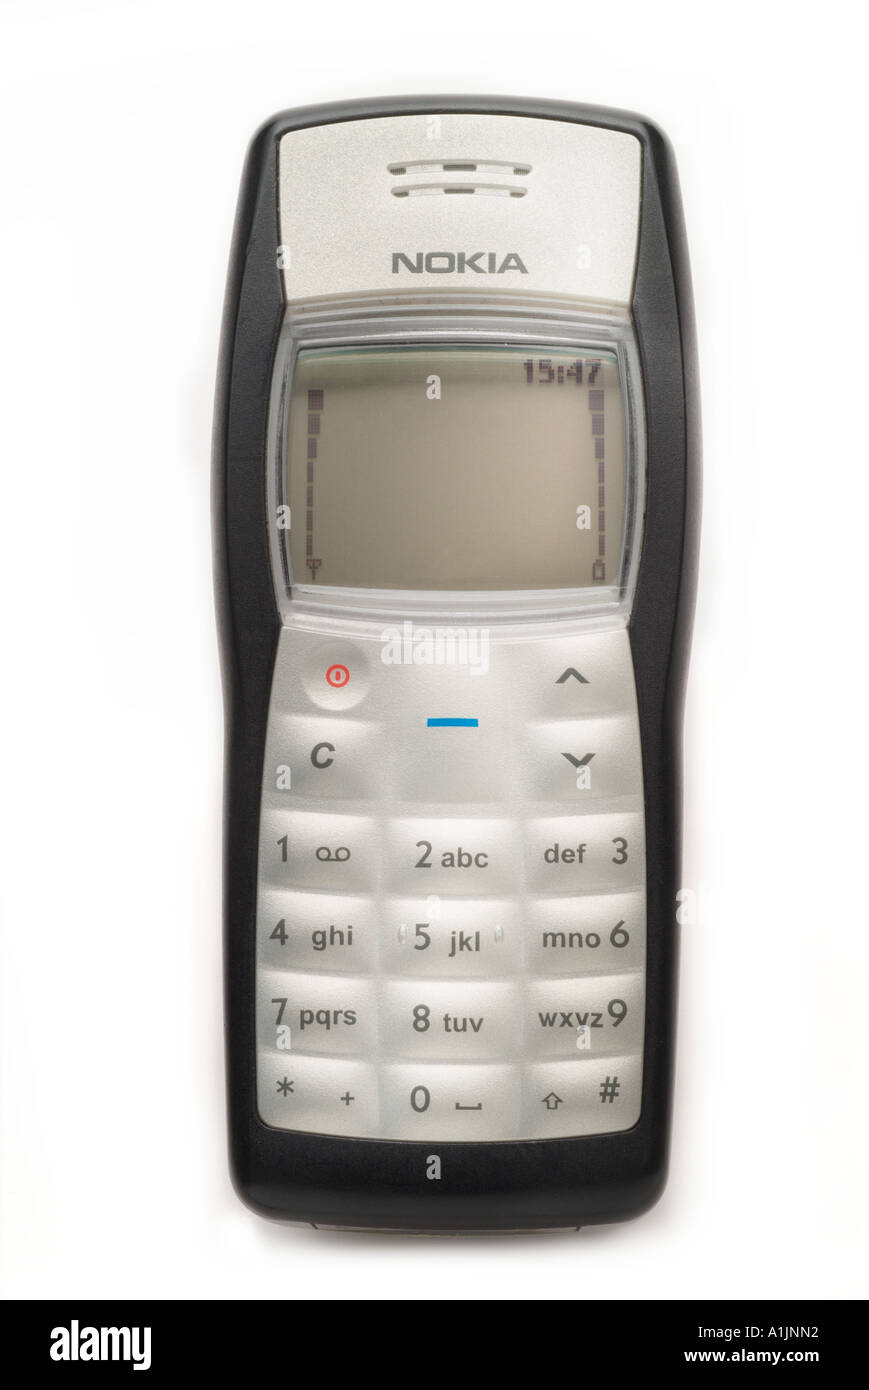 nokia mobile phone soft keypad liquid crystal display cheap basic